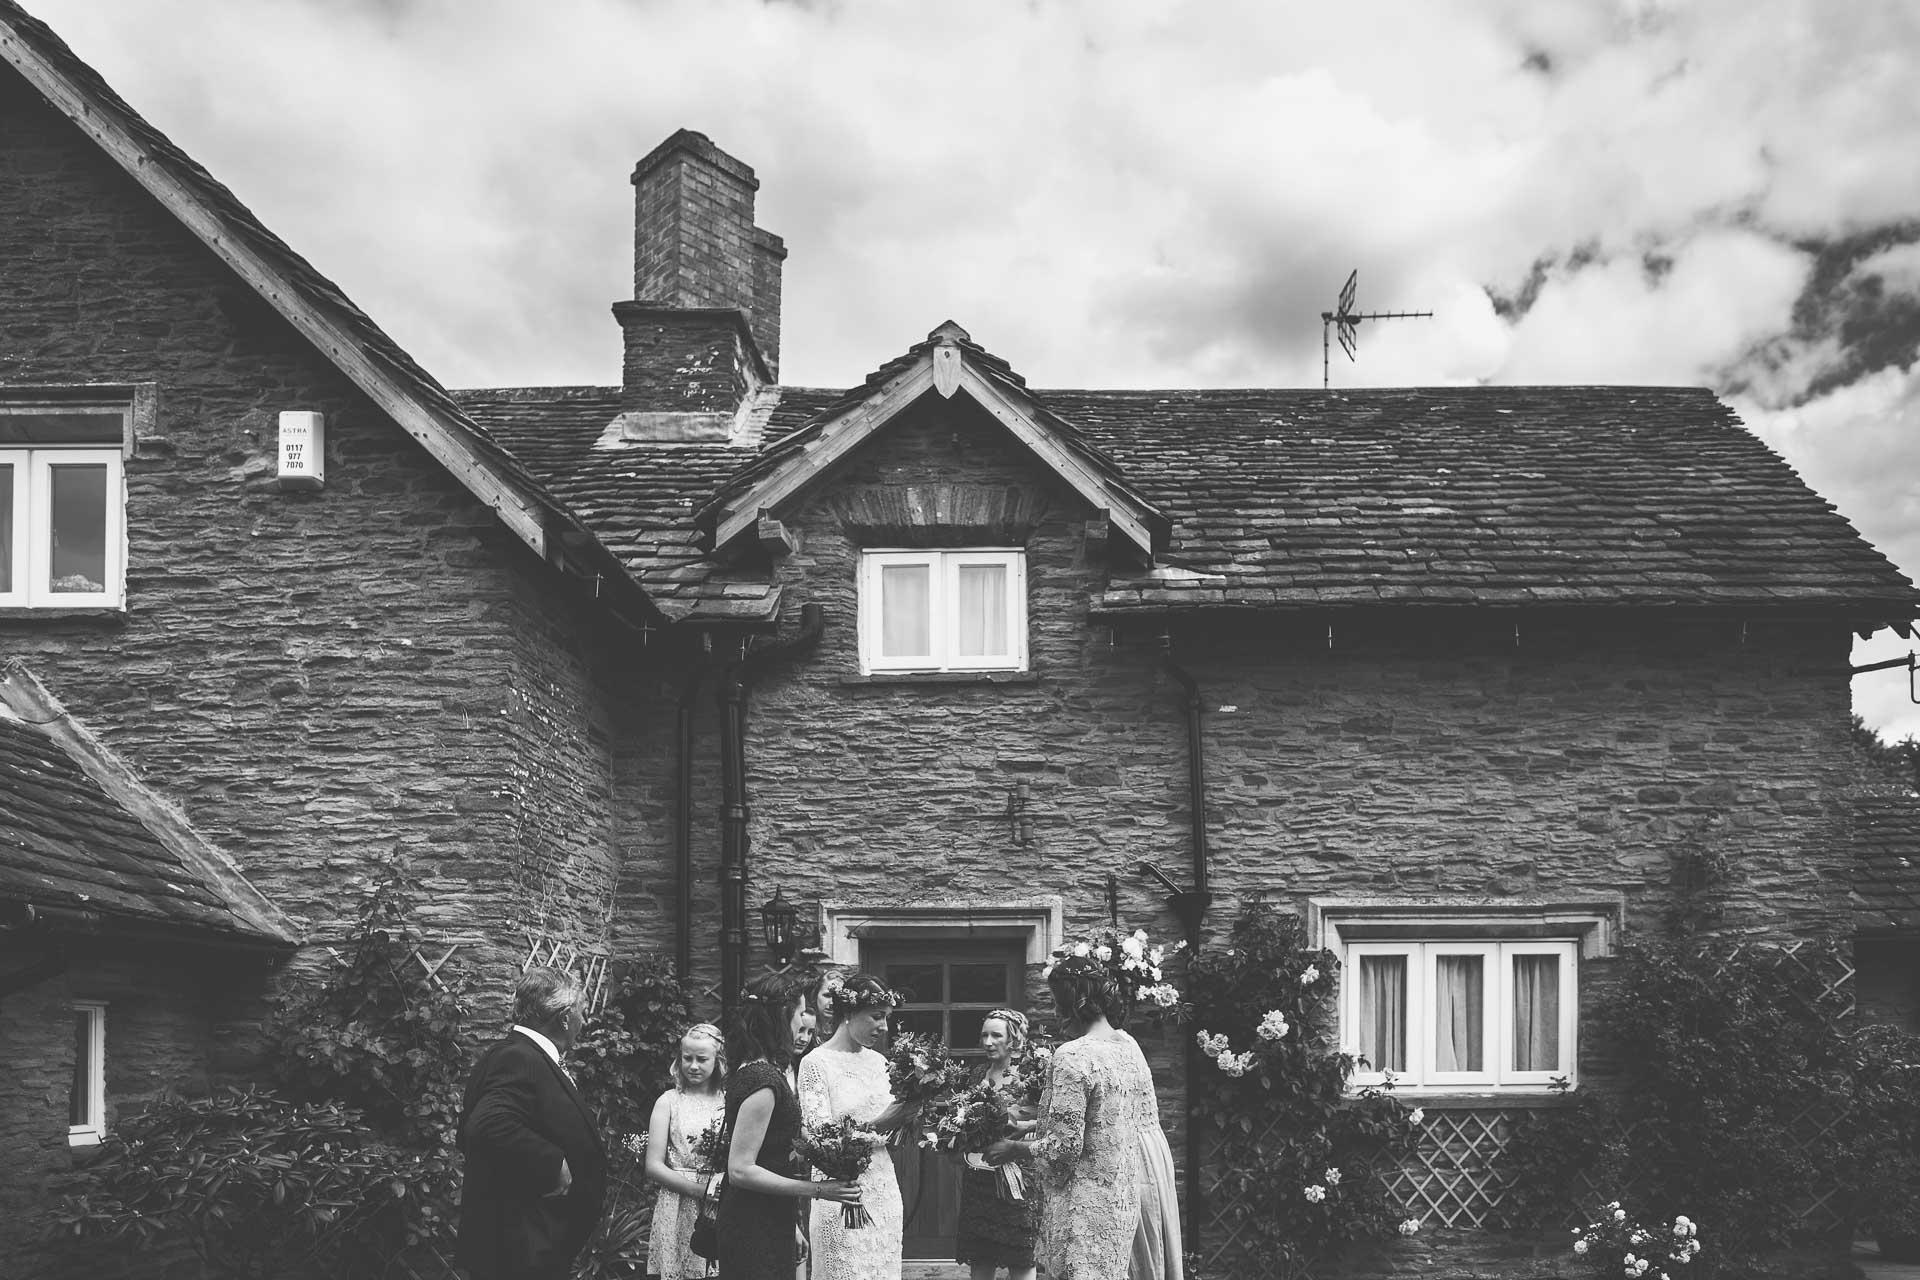 winterbourne-medieval-barn-wedding-photography-emma-andrew-49